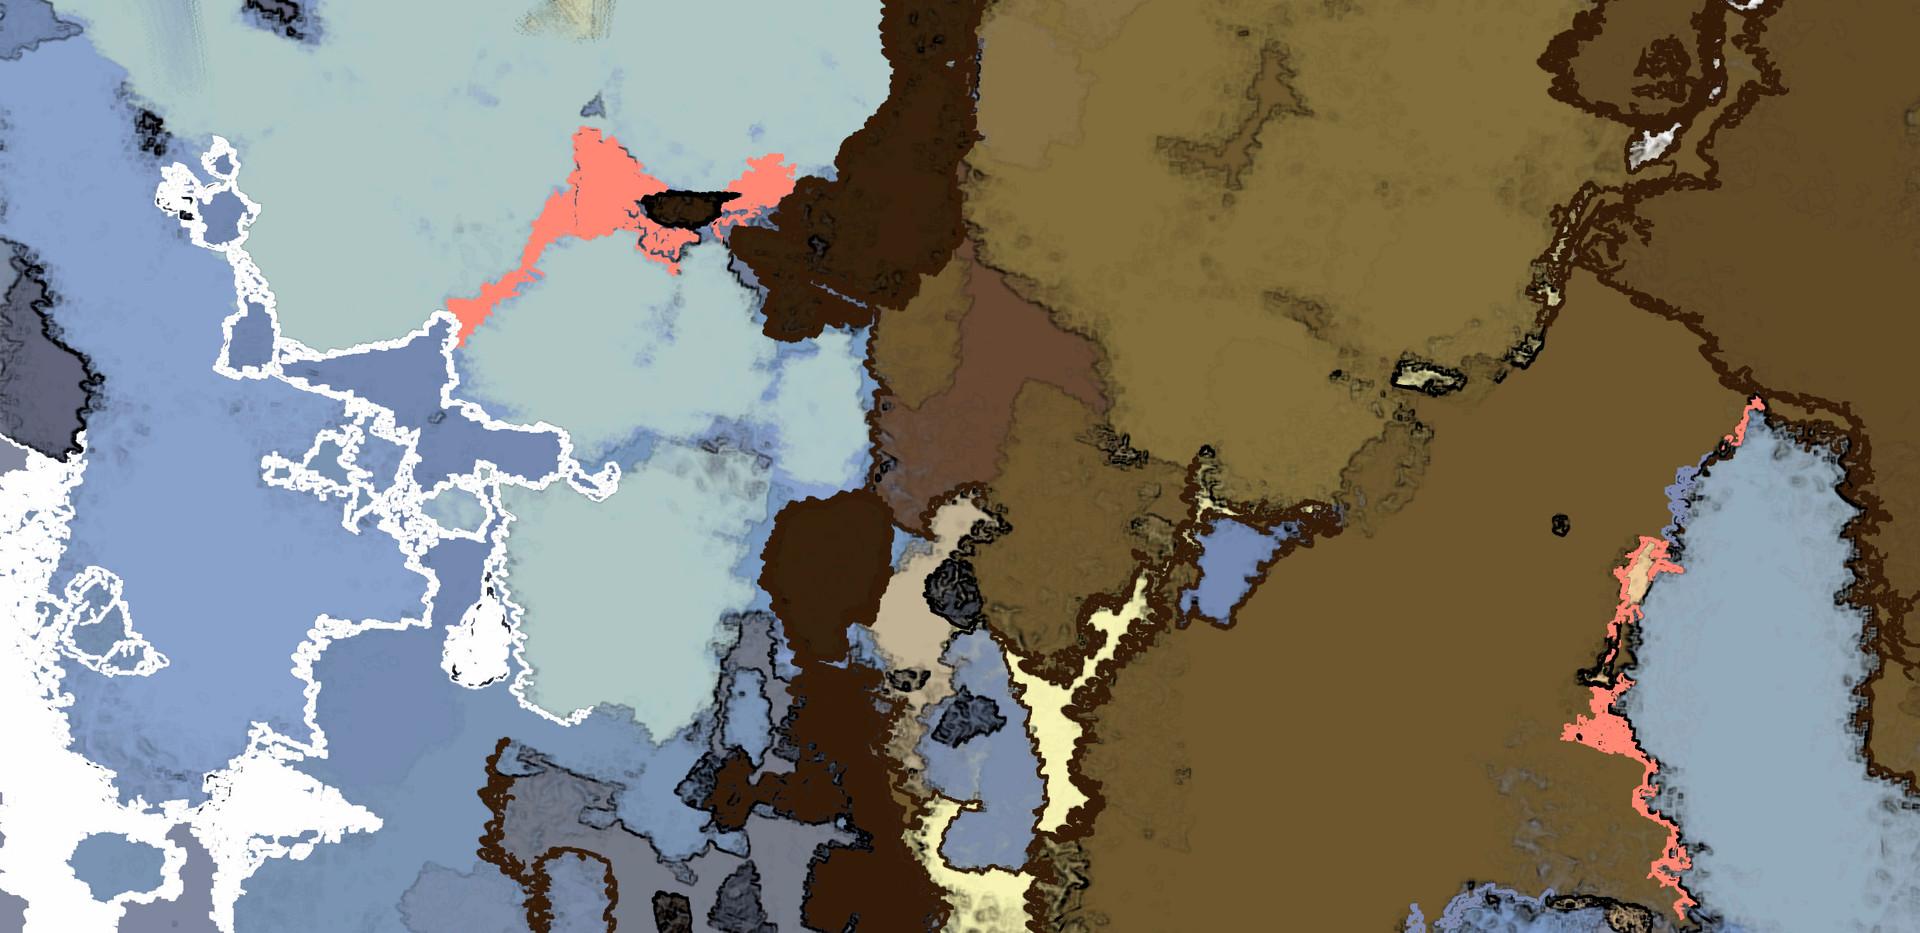 azulnegroblancodorado2.jpg